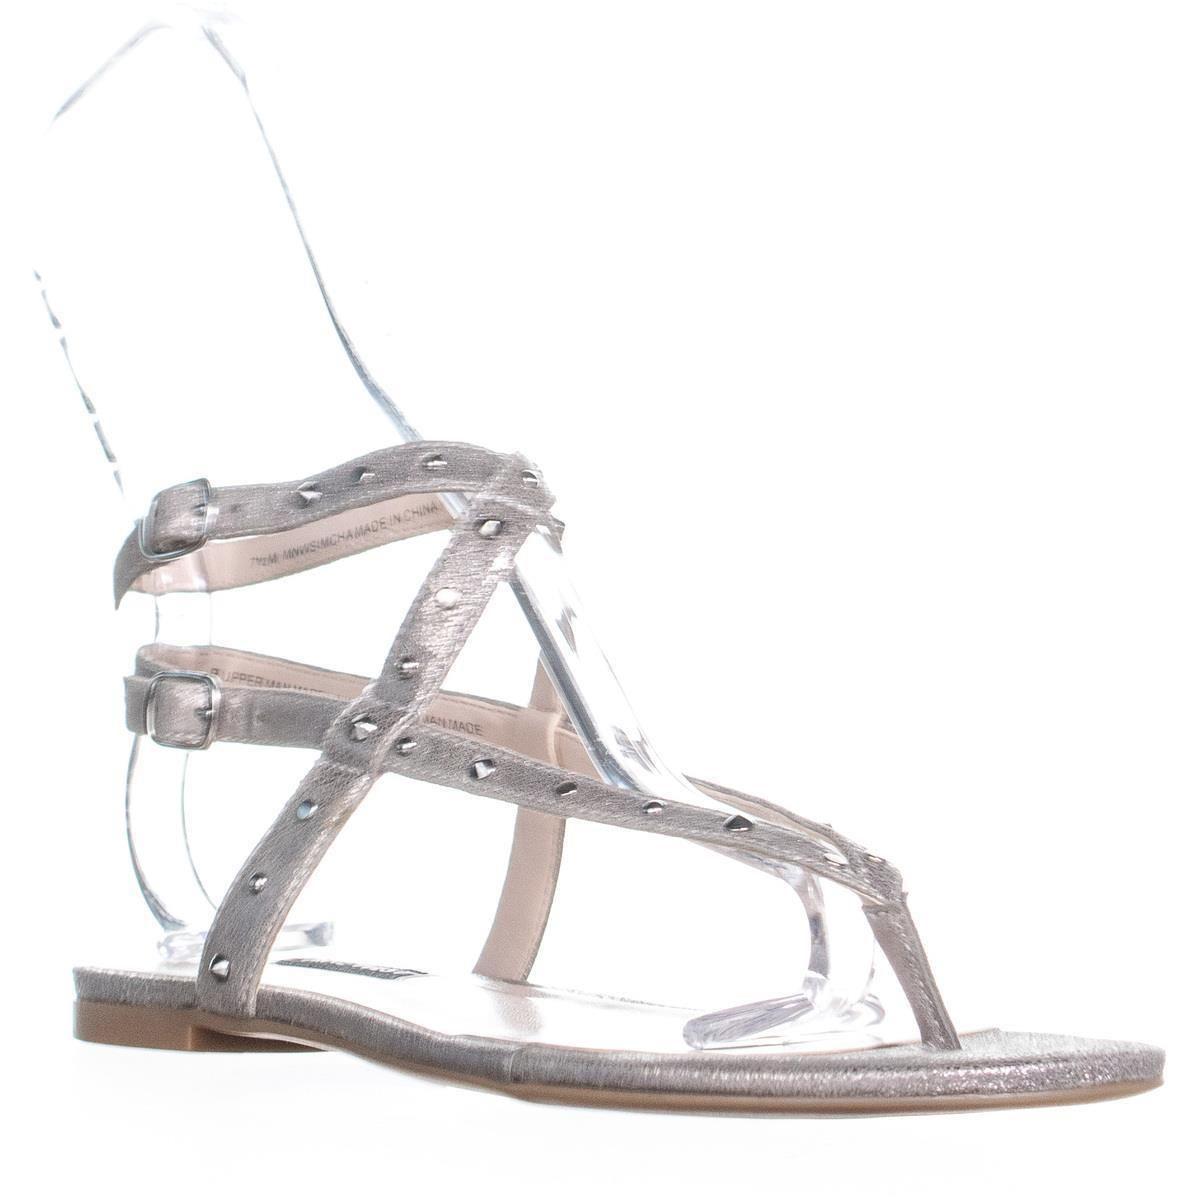 fc9865f03 Lyst - Nine West Simcha Flat Double Buckle Strap Sandals - Save 13%